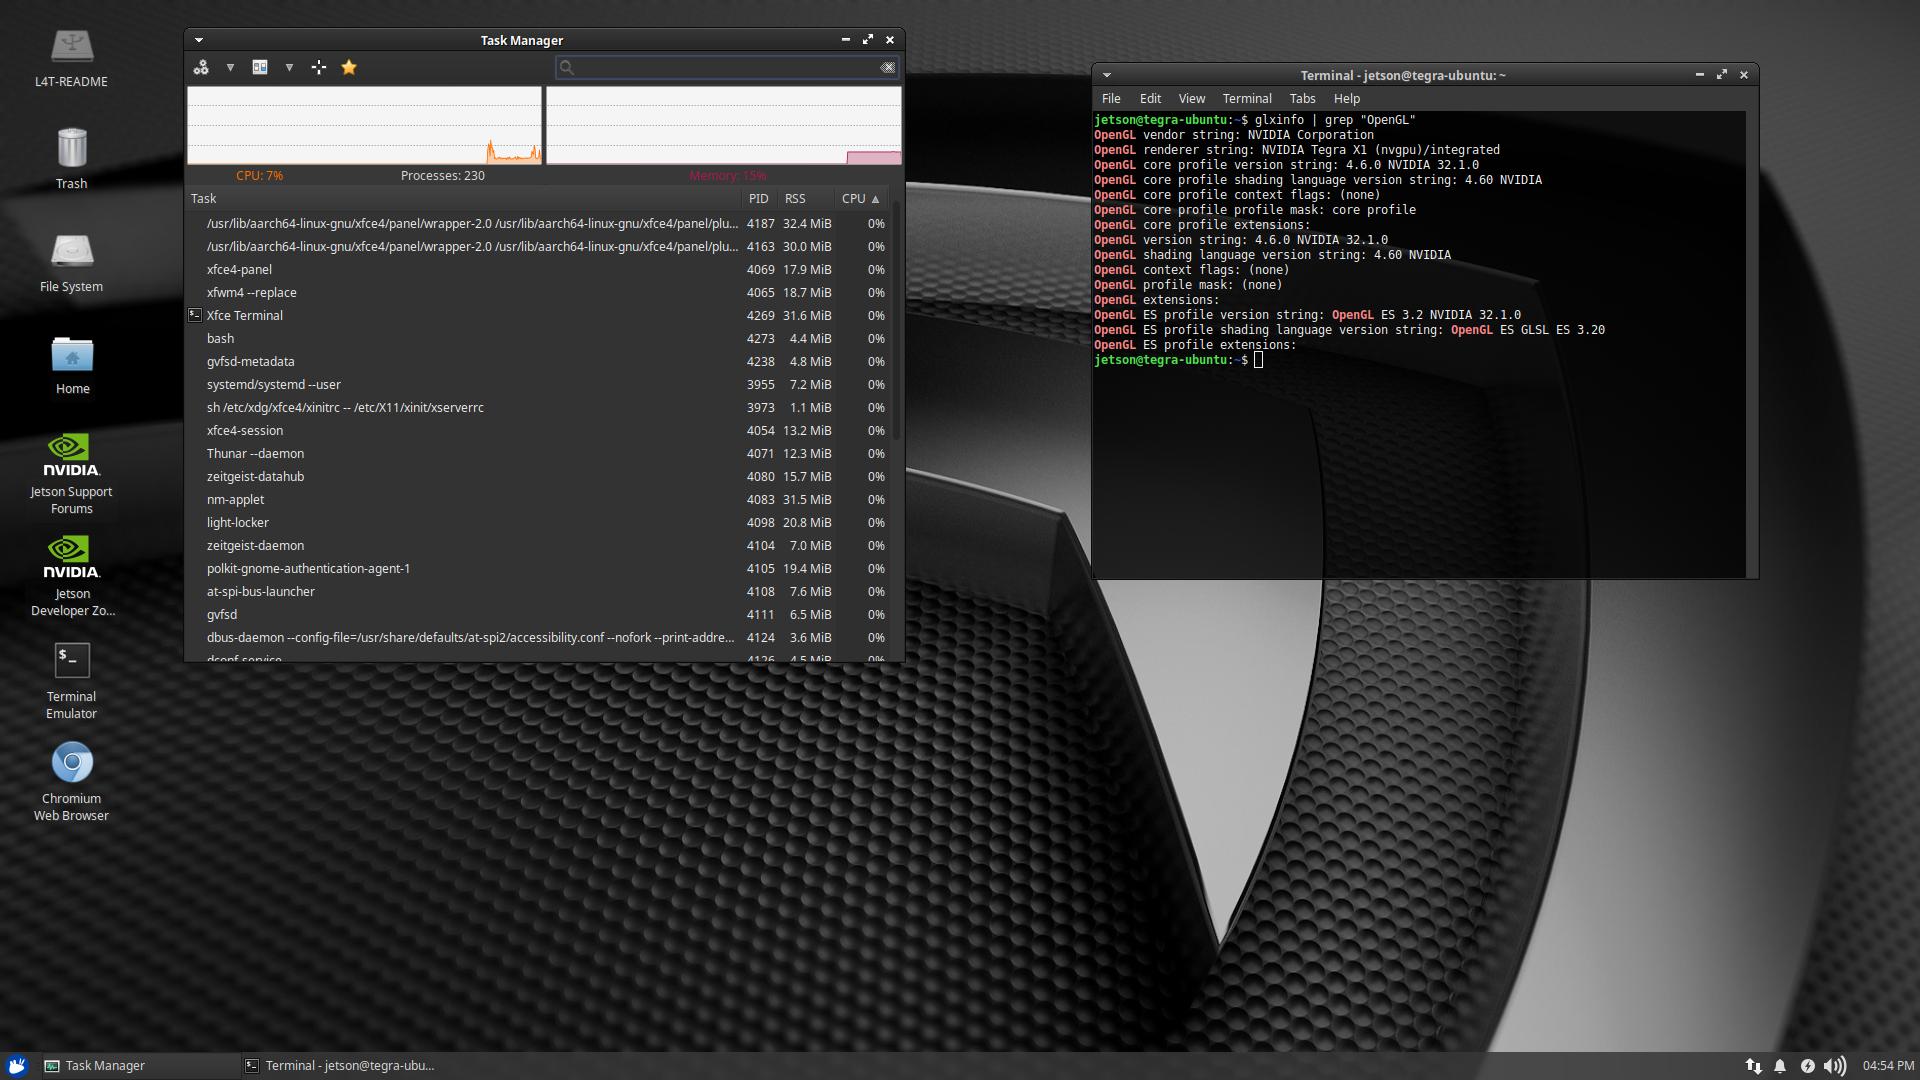 Xubuntu-Core / XFCE4 18 04 2 - Custom Image for the Jetson